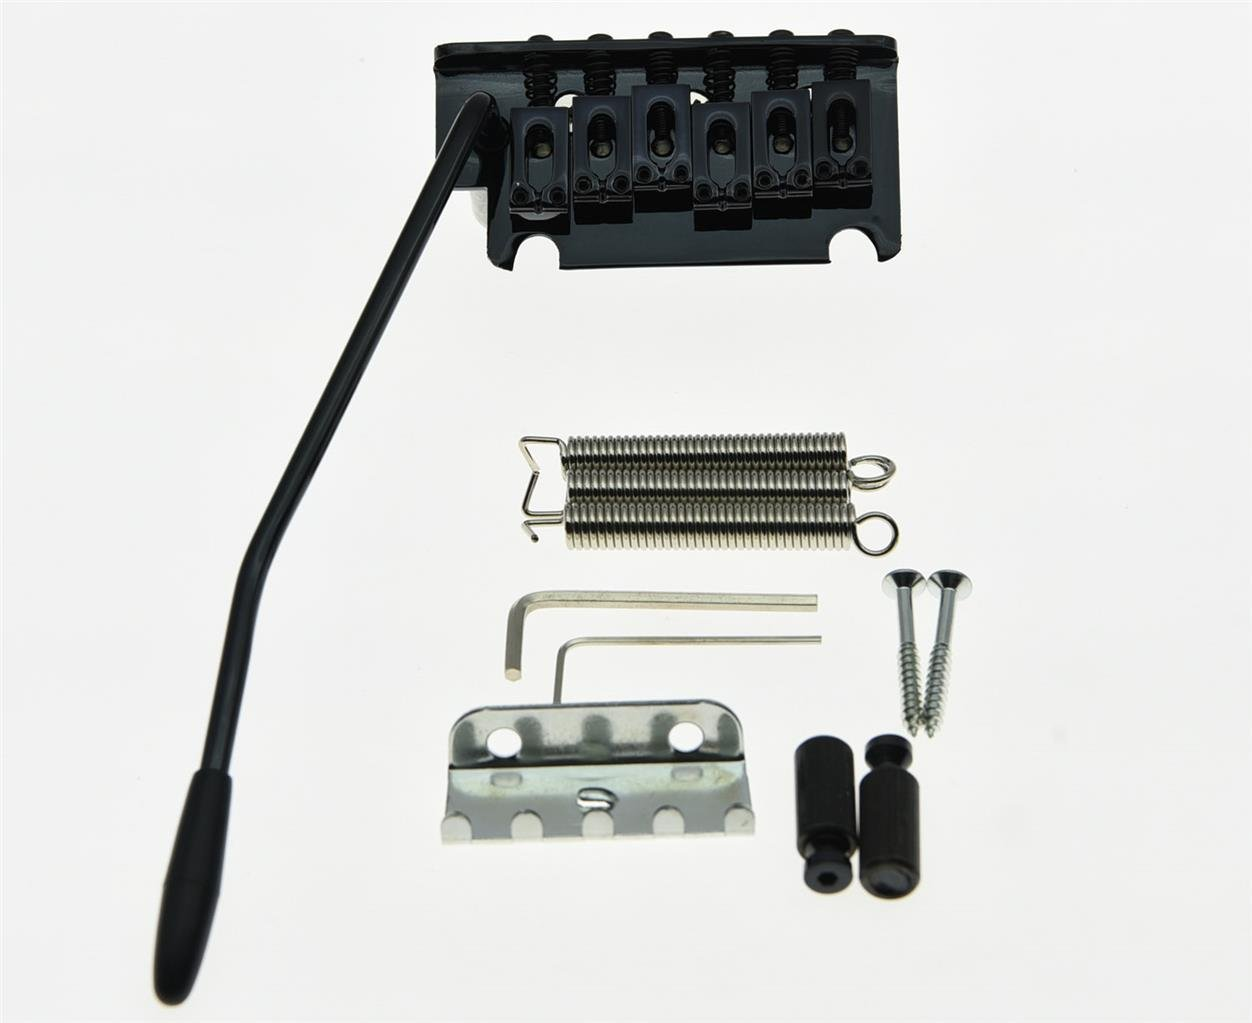 Black 2 Point ST Strat Style Guitar Tremolo Bridge Locking System After market Guitar Bridge